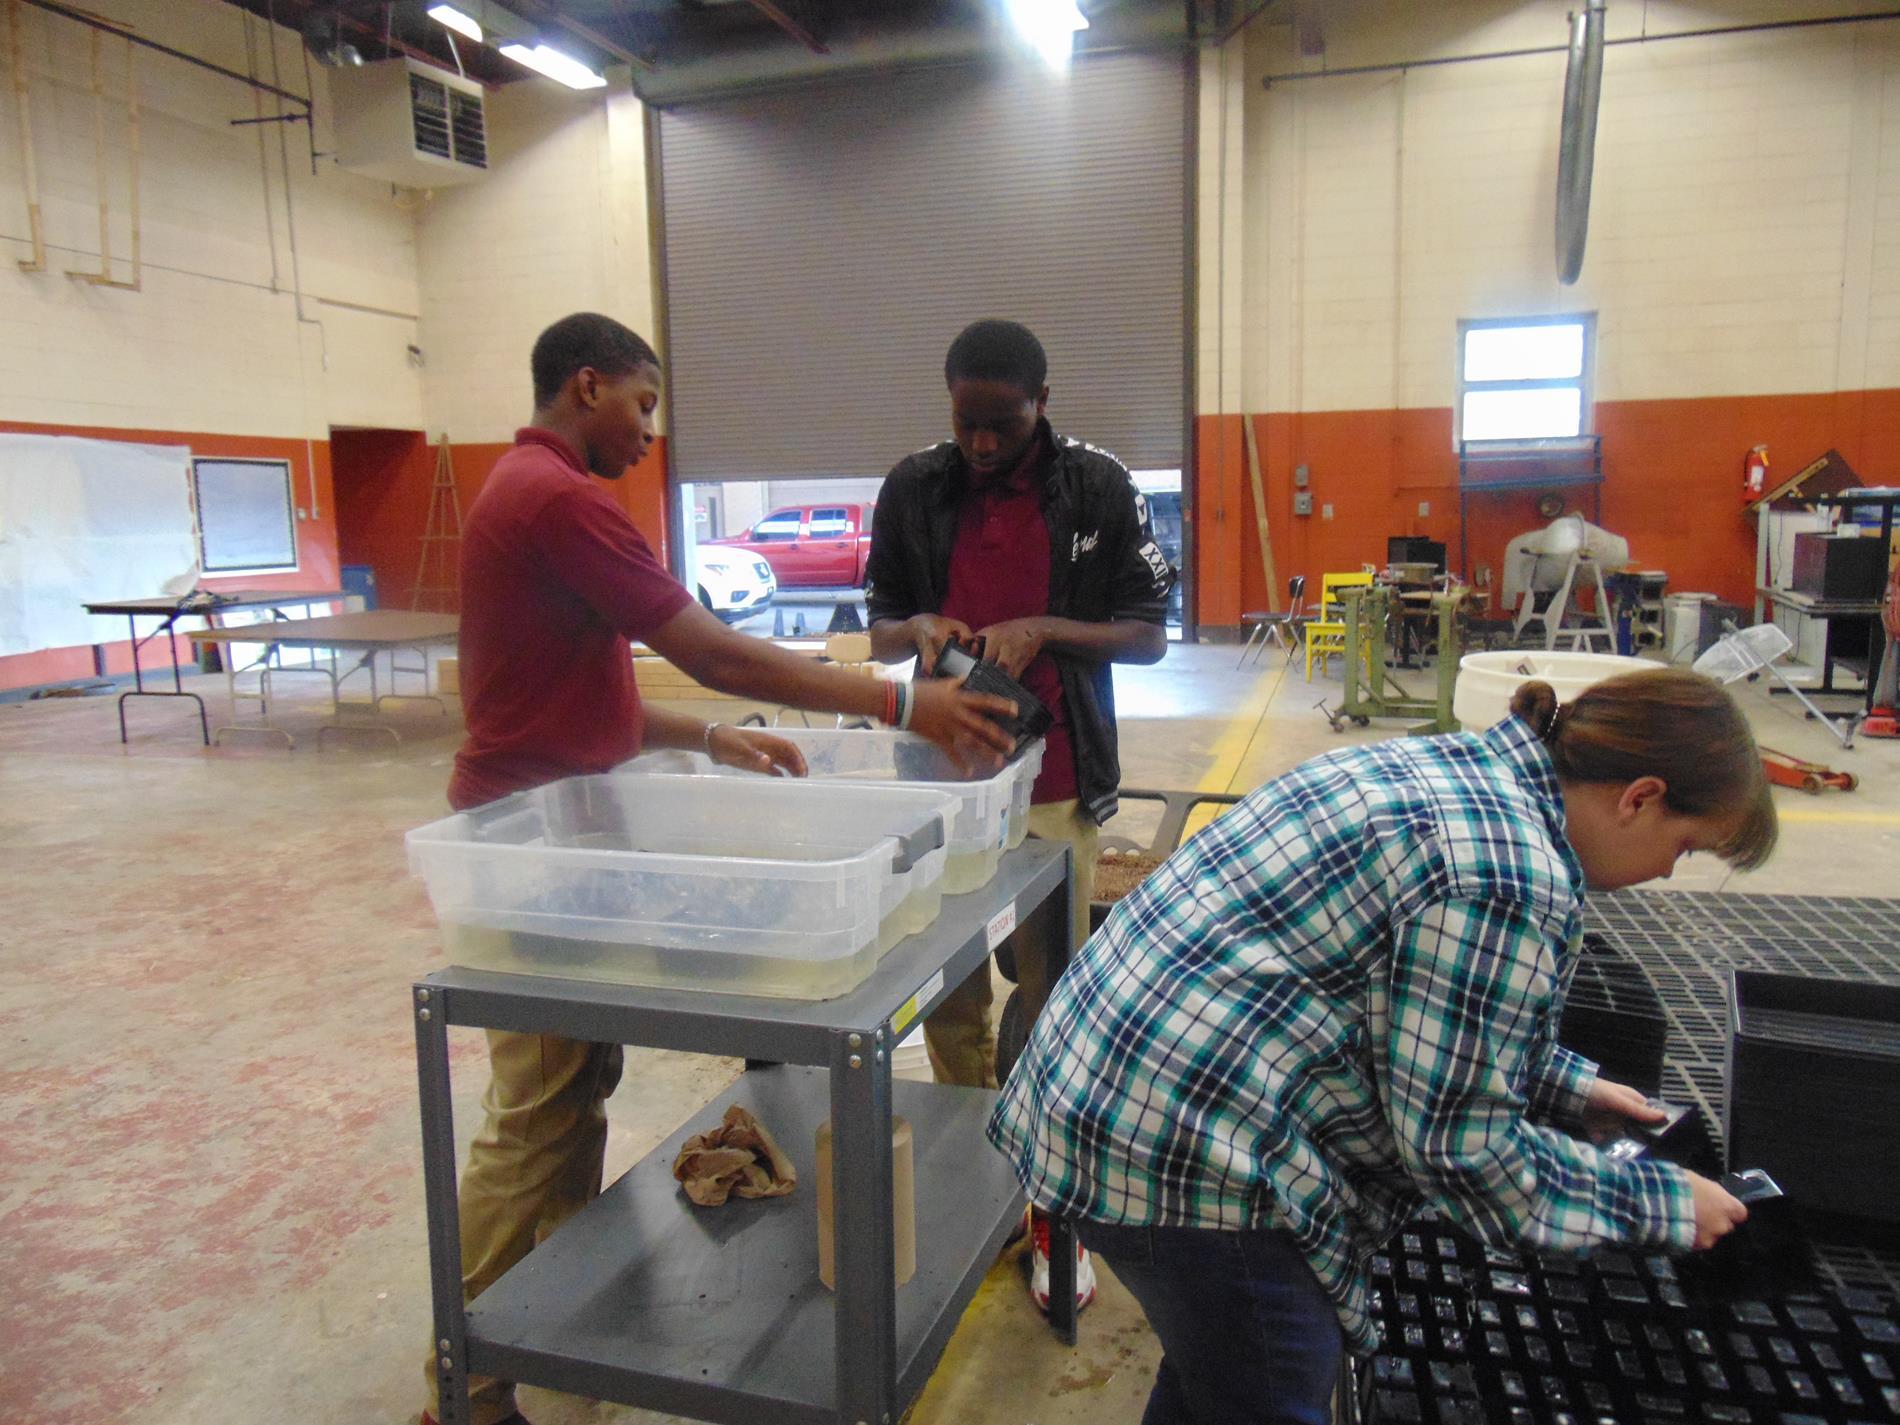 Agriculture class preparing seedlings